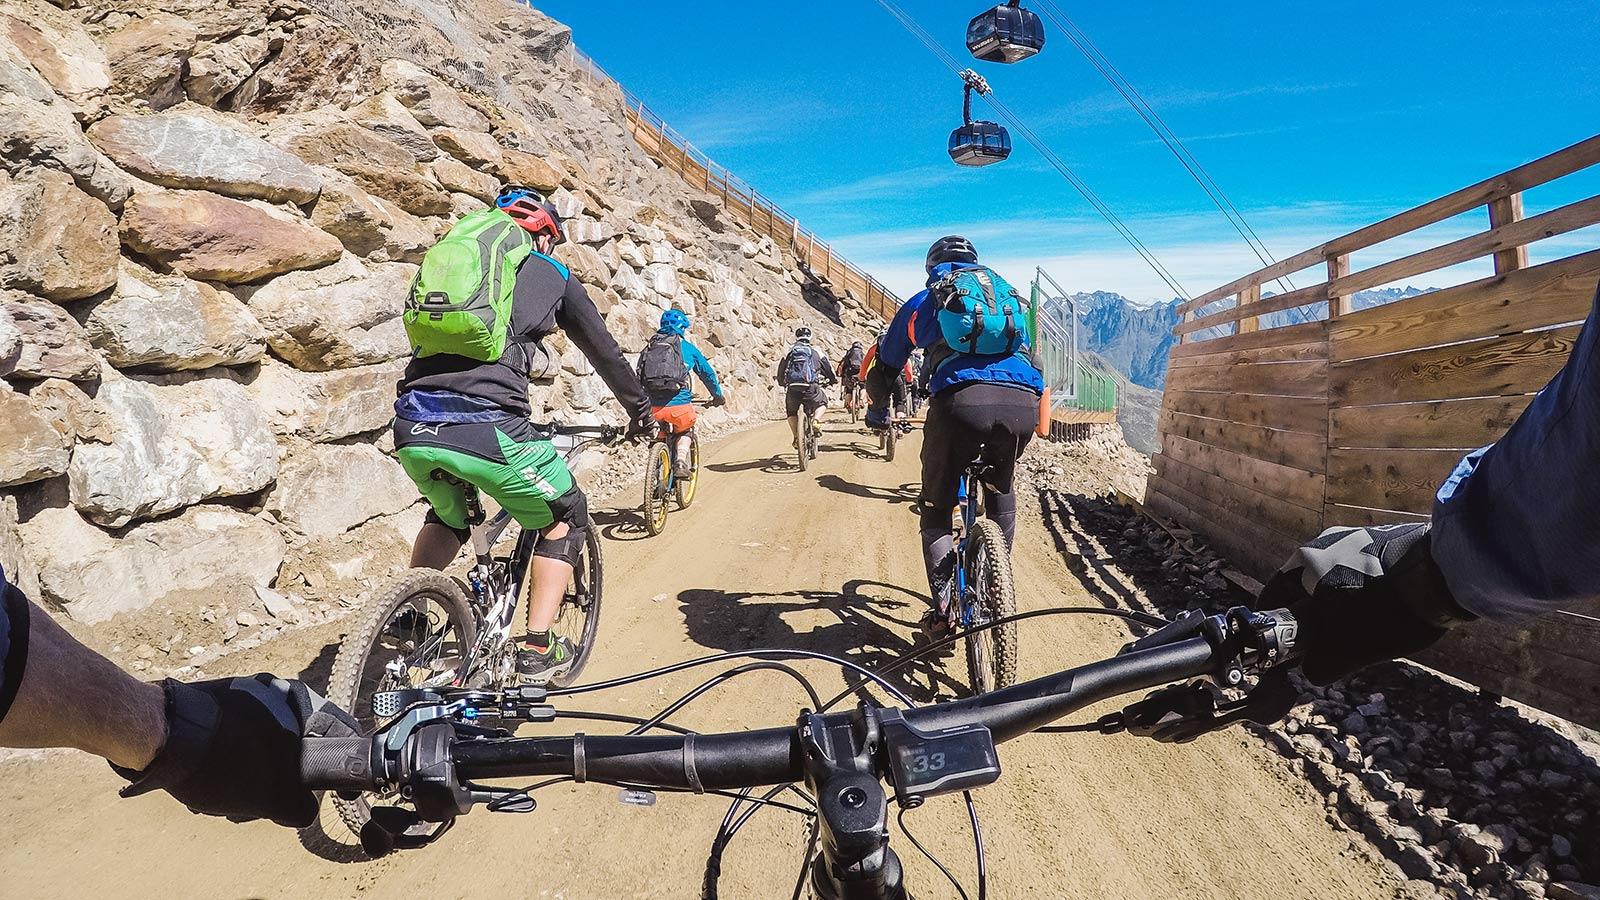 Event Schnitzeljagd 2017 - Downhill